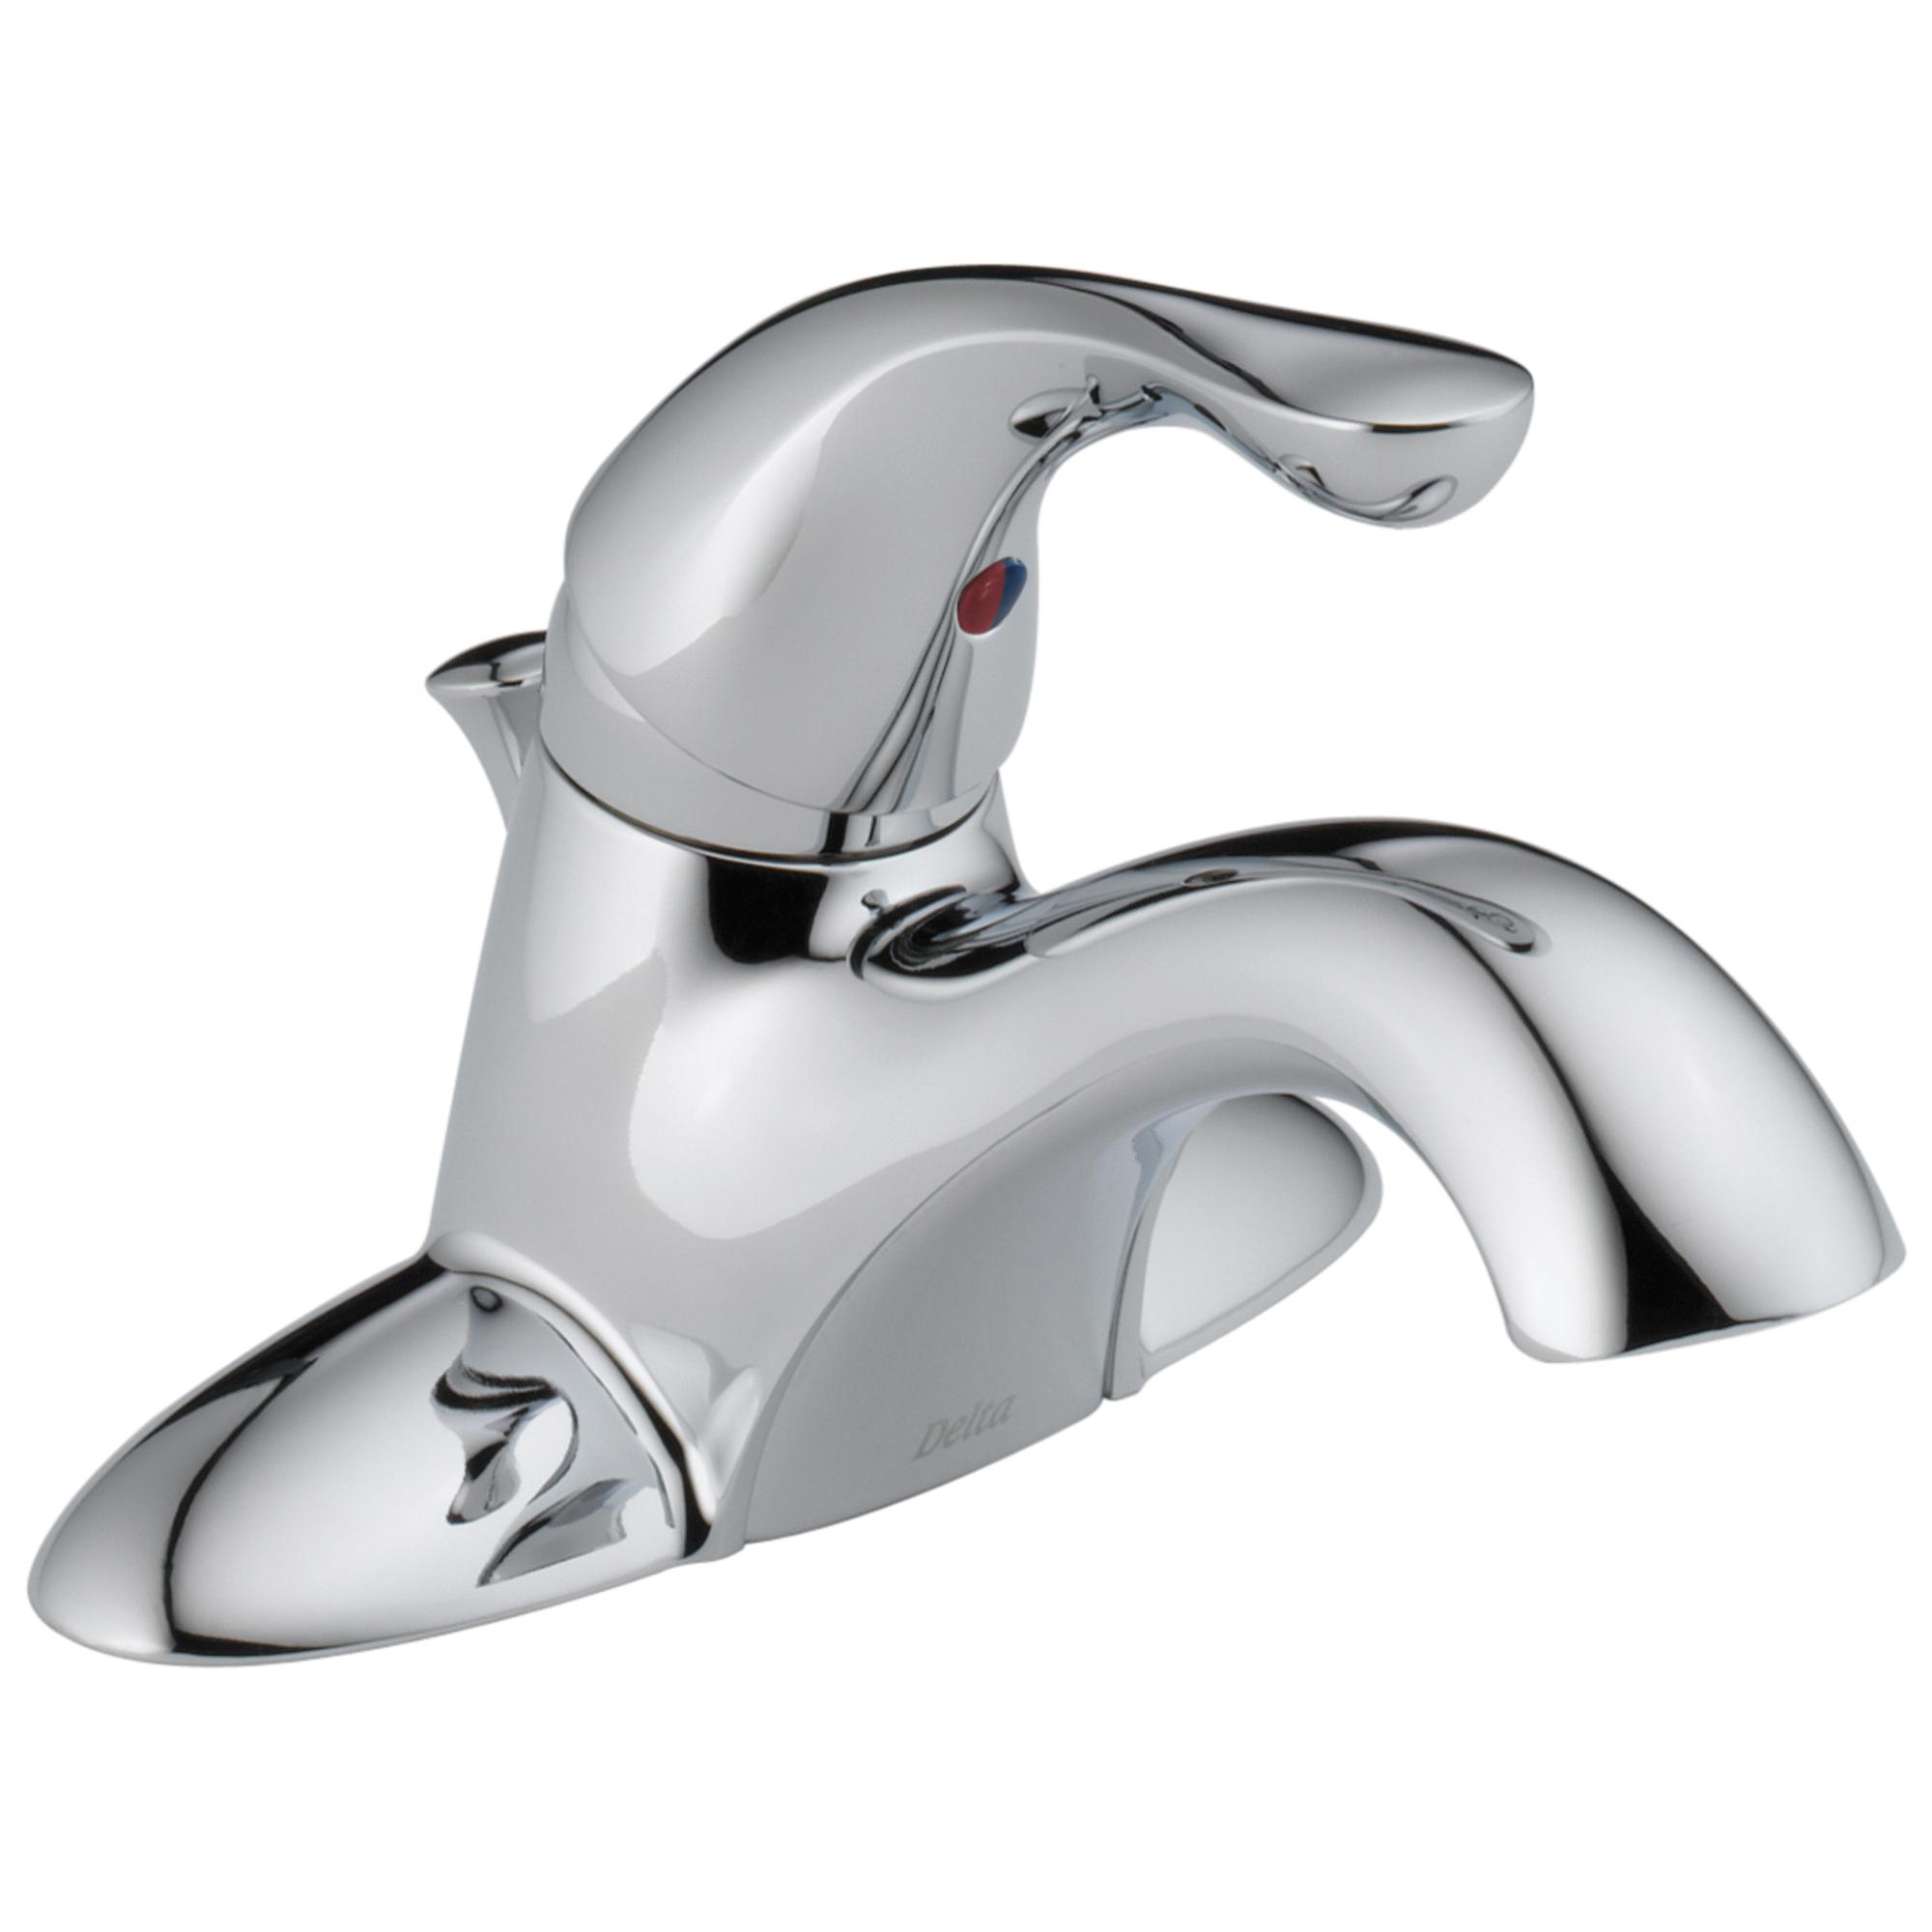 DELTA® 520LF-WFMPU Lavatory Faucet, Classic, Chrome Plated, 1 Handles, Metal Pop-Up Drain, 1.2 gpm